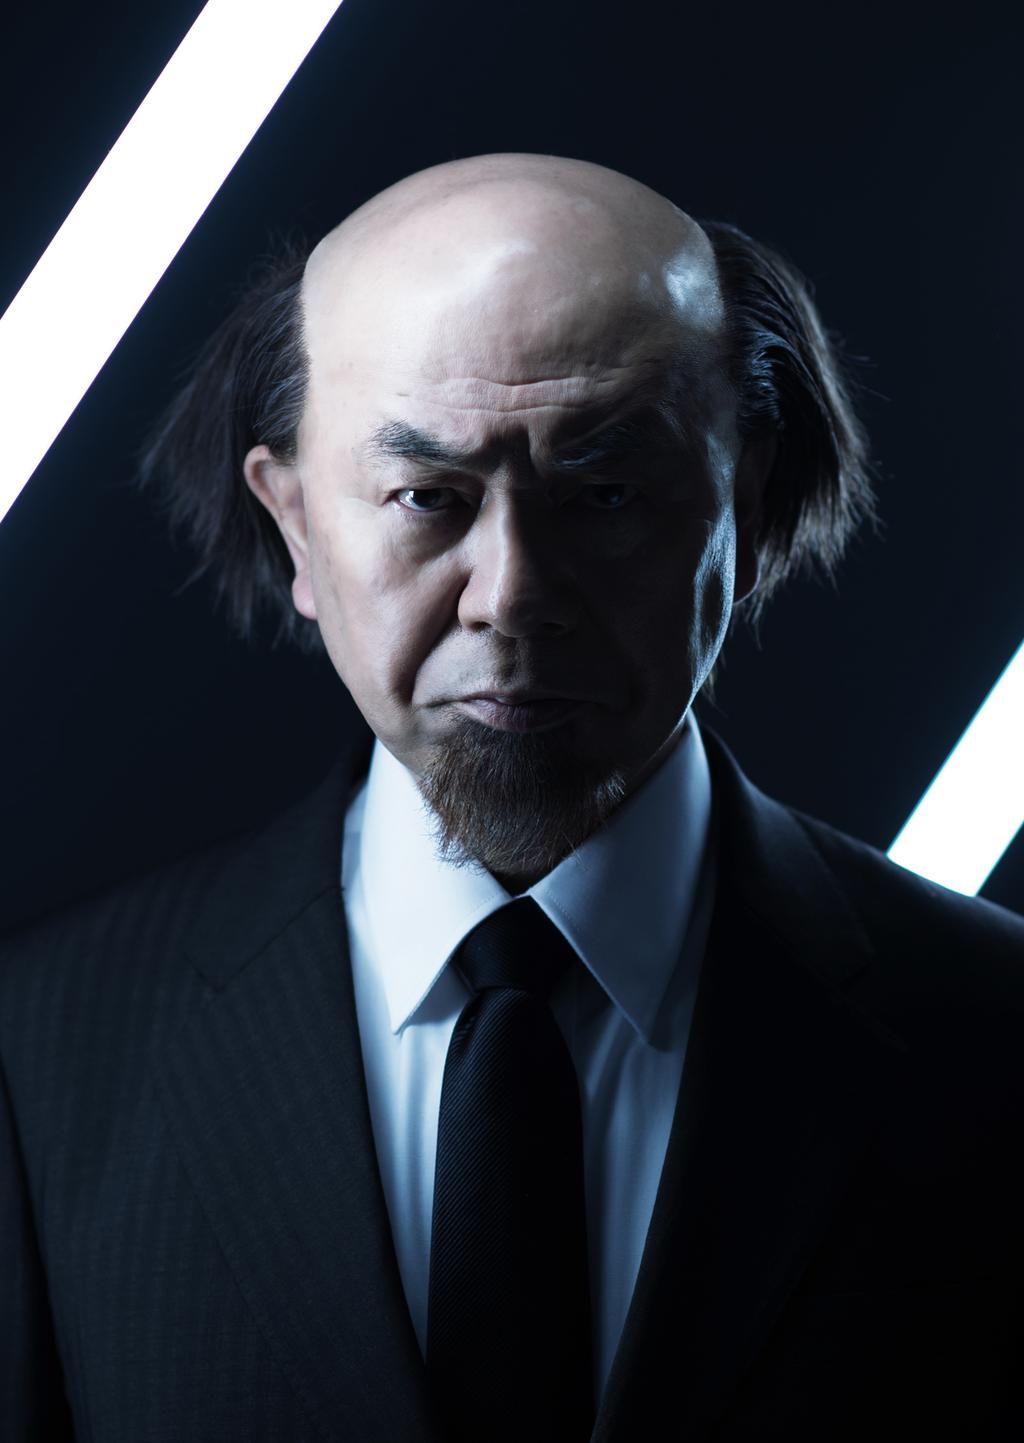 Aramaki joué par Ikkyu Jyuku